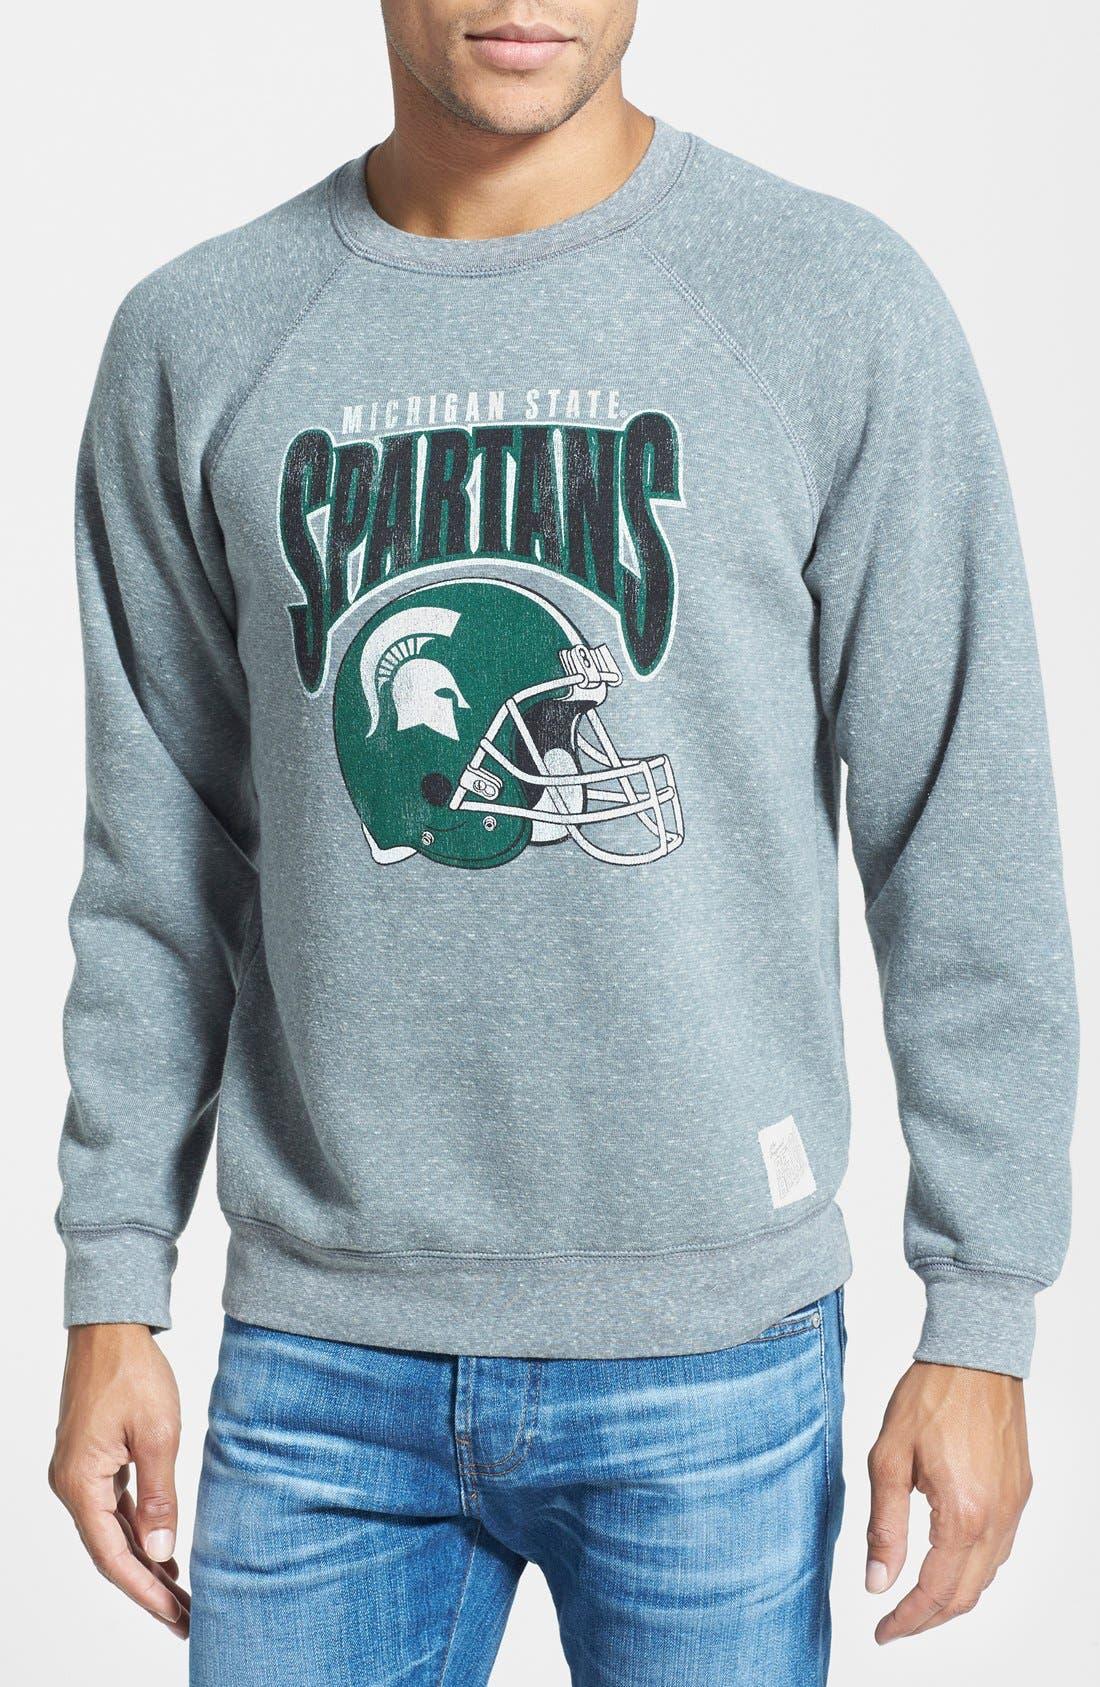 Main Image - Retro Brand 'Michigan State Spartans Football' Slim Fit Raglan Crewneck Sweatshirt